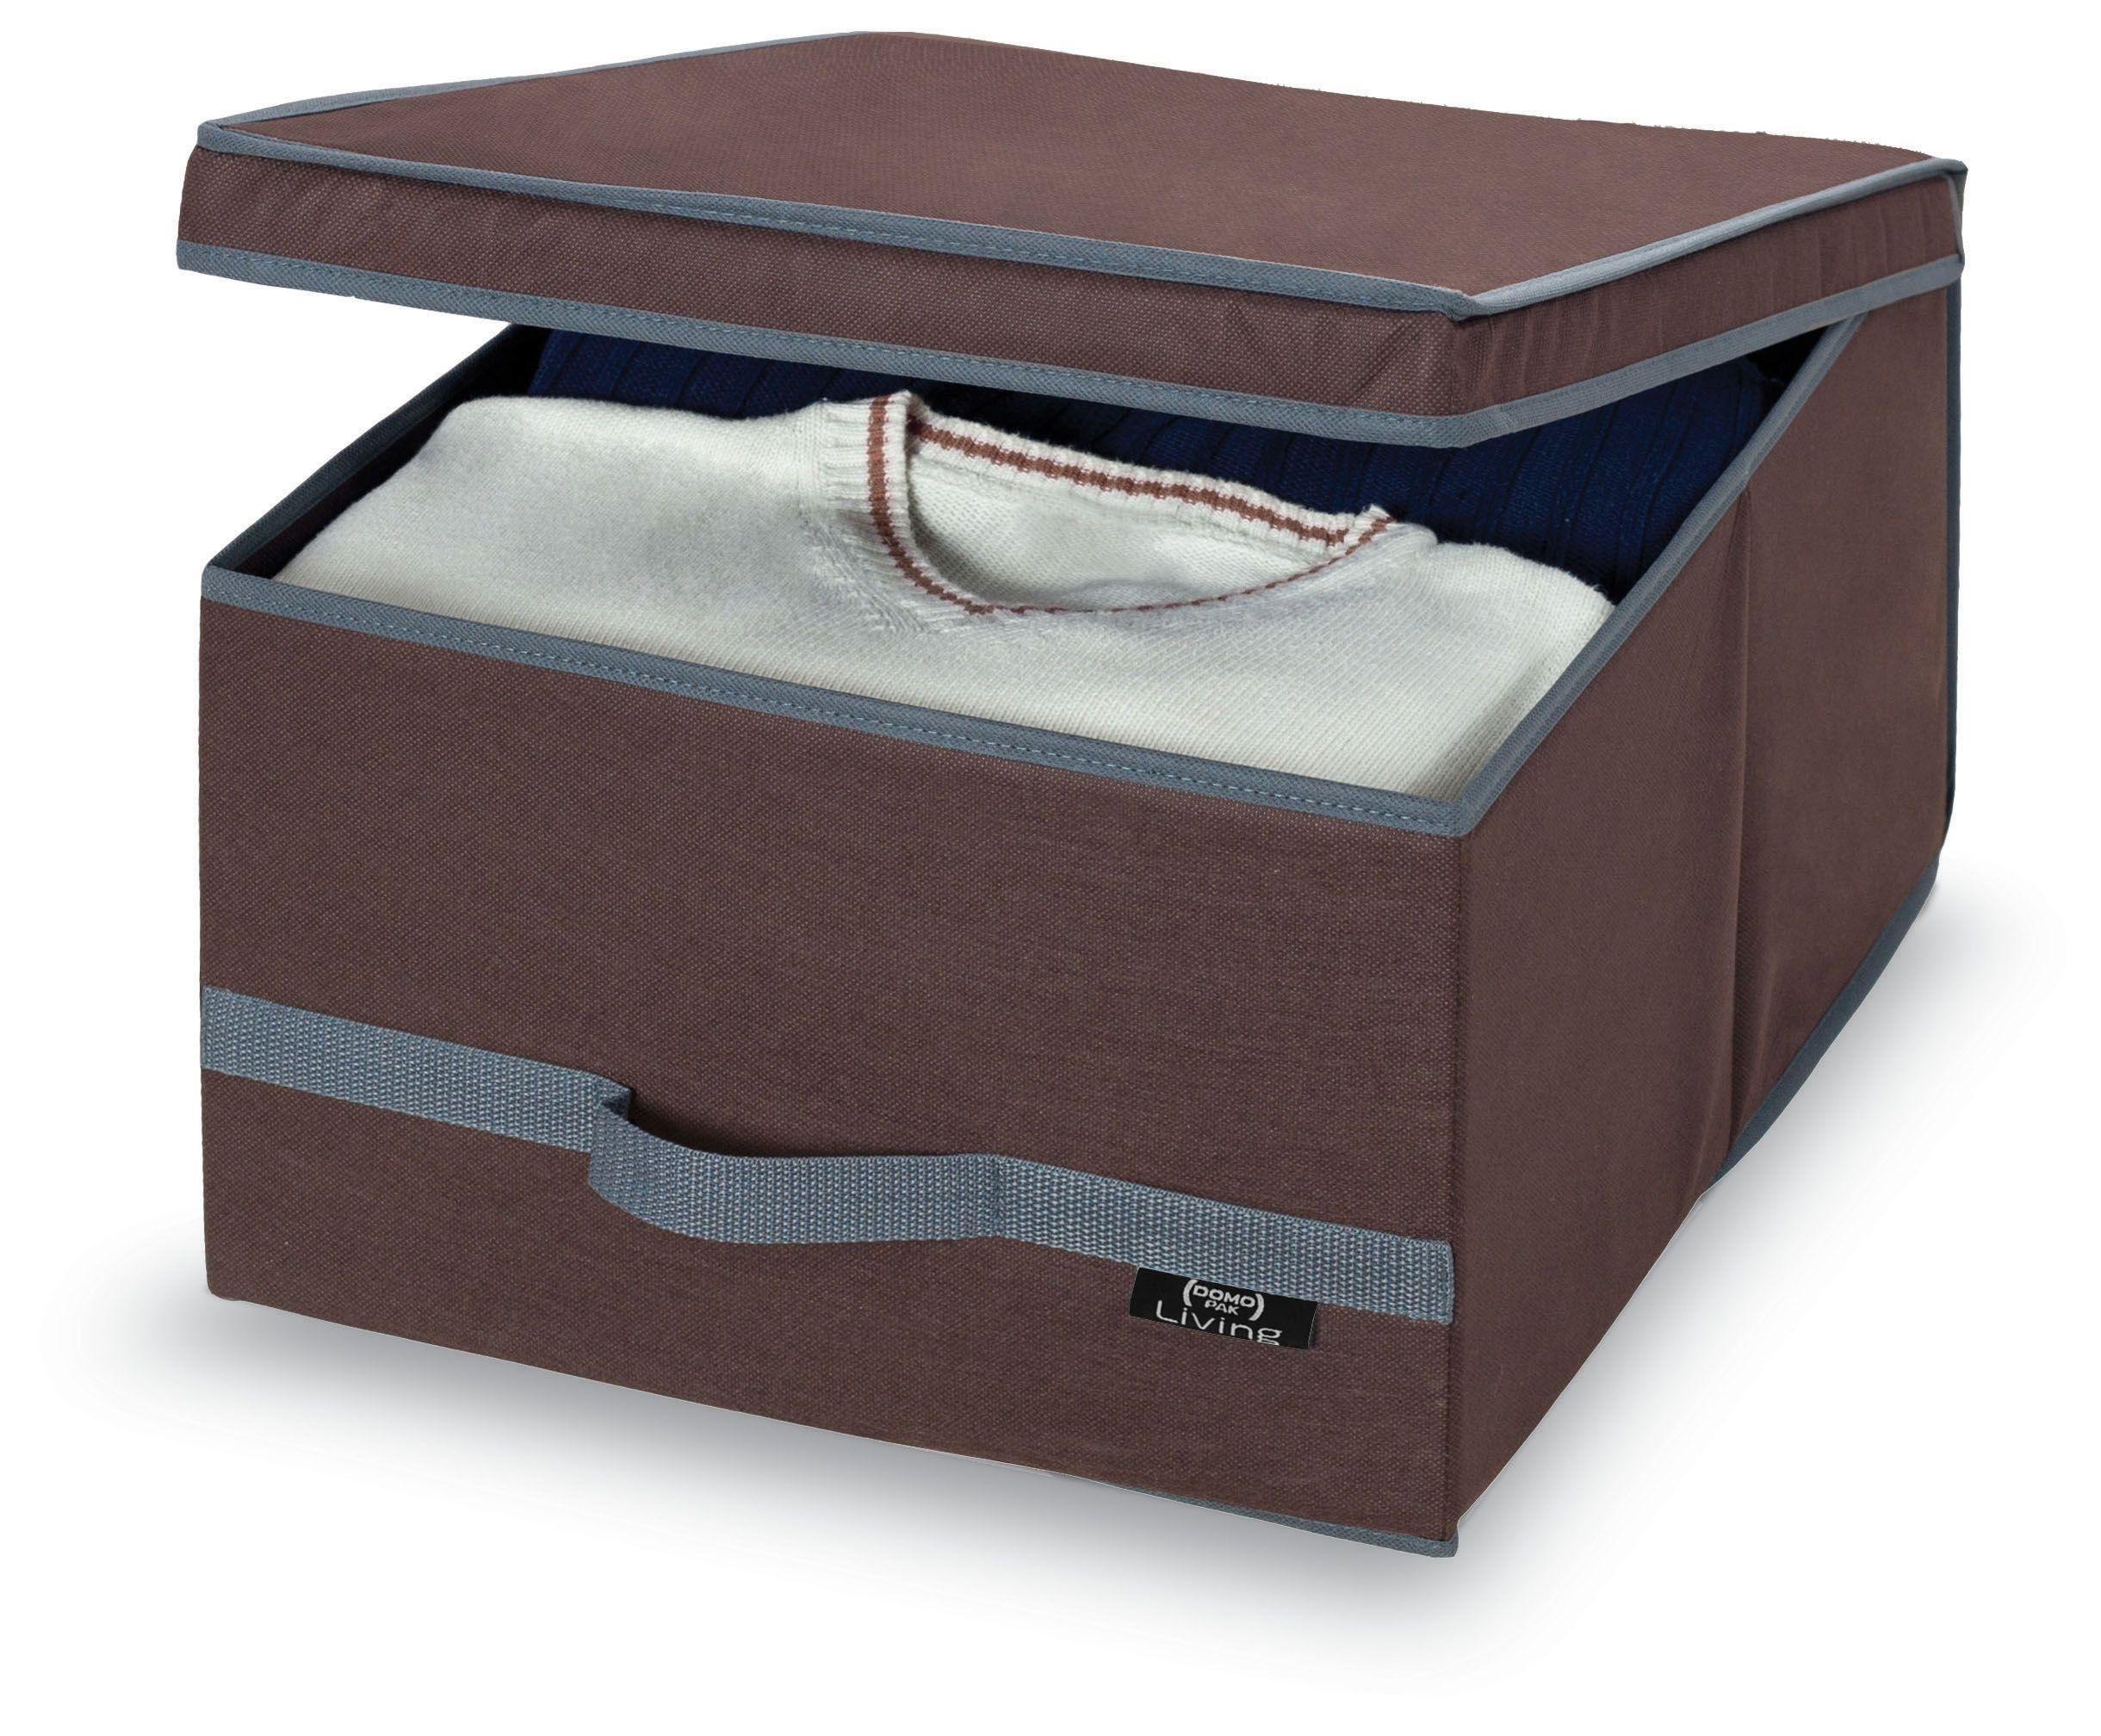 Cutie pentru depozitare din carton si polipropilena, Classic L Maro, L50xl38xH24 cm somproduct.ro